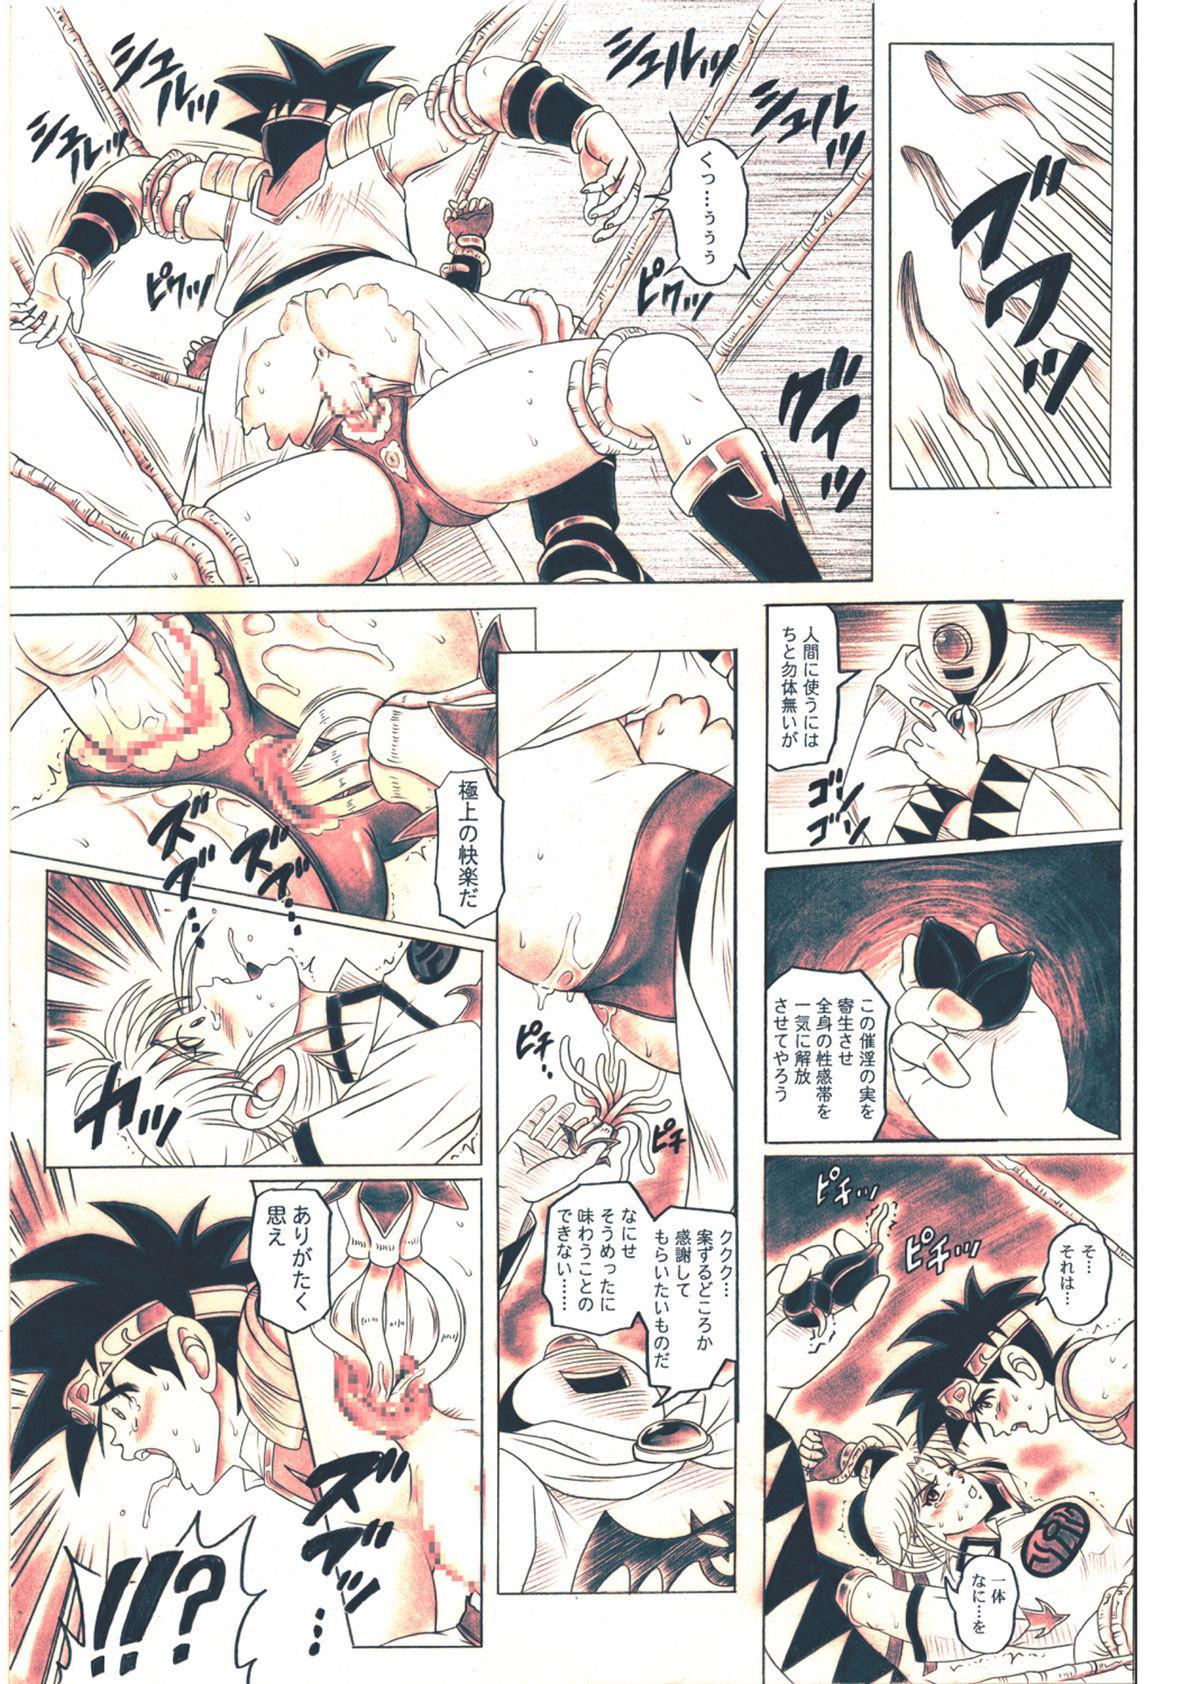 [Cyclone (Reizei, Izumi)] STAR TAC IDO ~Youkuso Haja no Doukutsu he~ Chuuhen Download edition (Dragon Warrior: Dai's Great Adventure) [Digital] 104